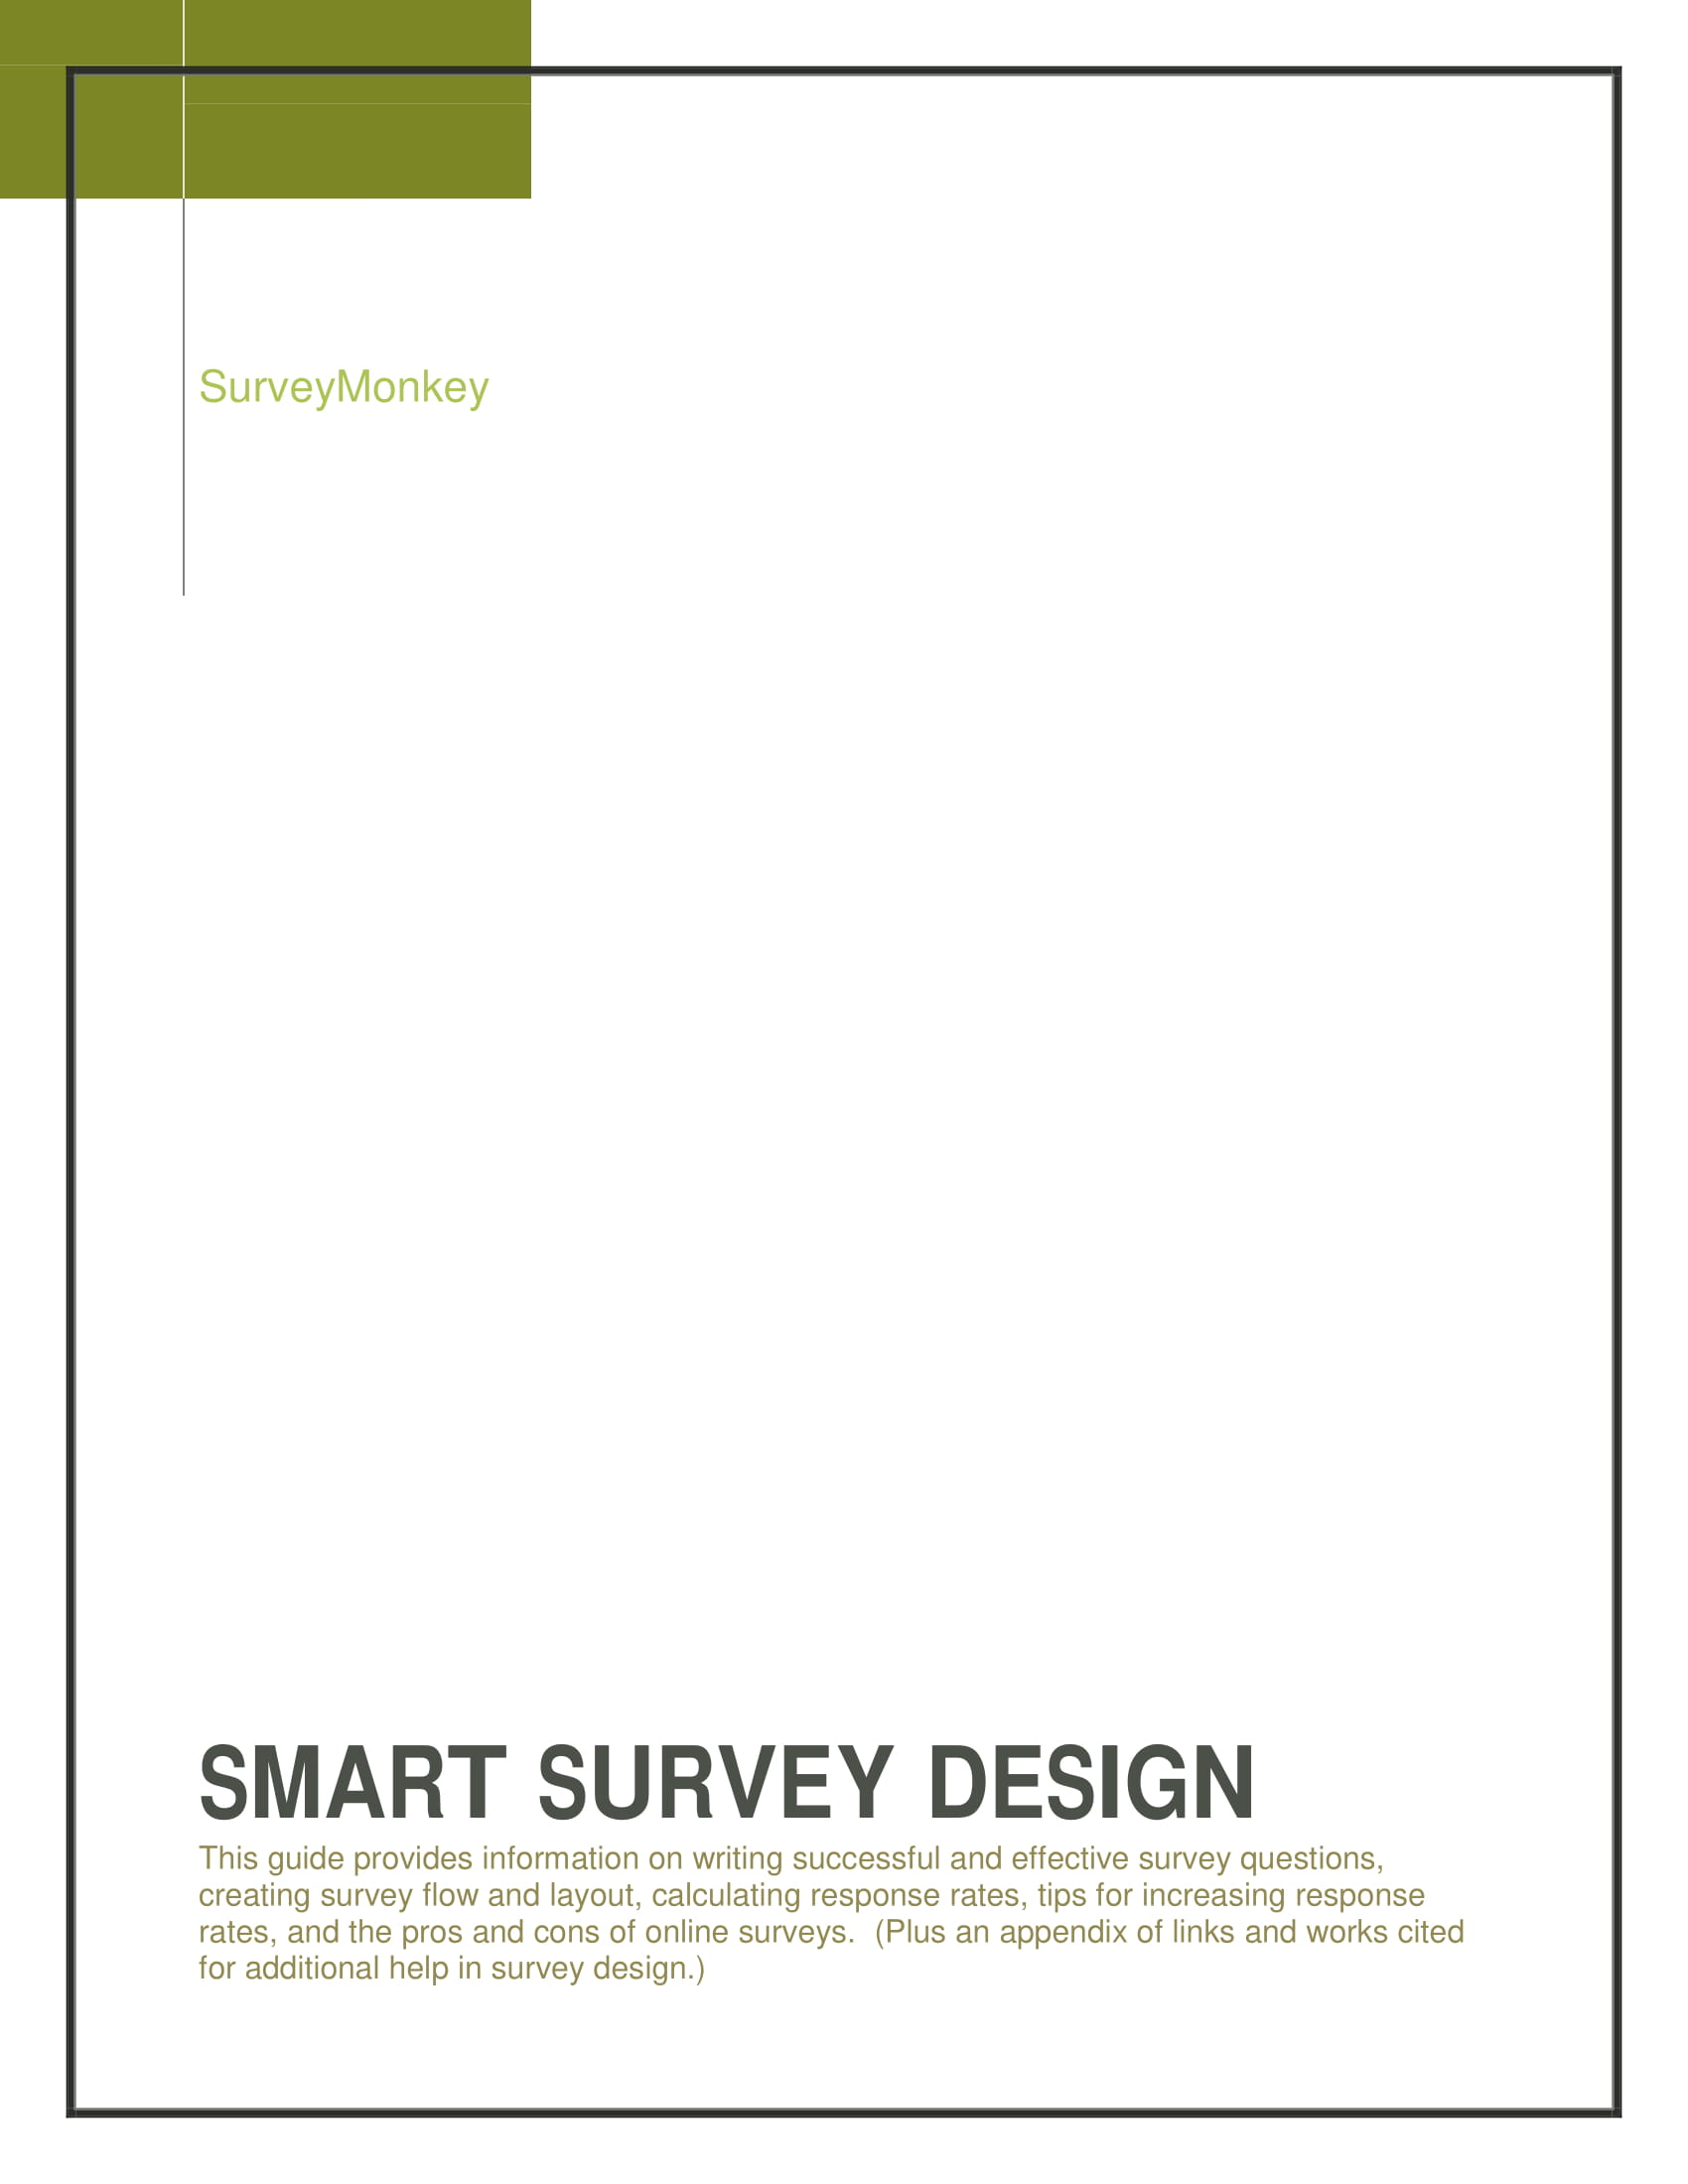 smartsurvey 01